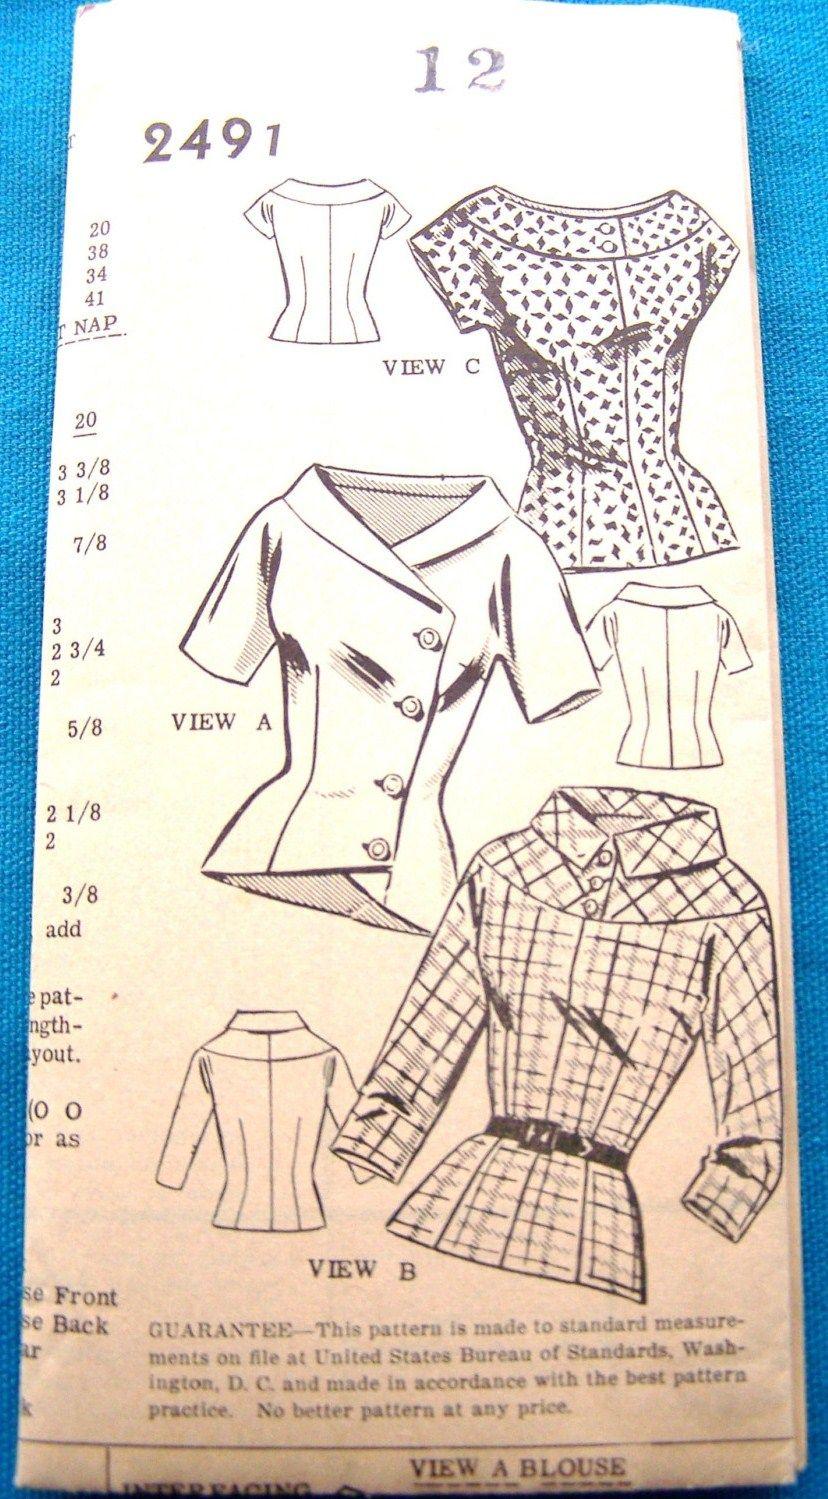 Mail Order 2491 Vintage Sewing Patterns Sewing Patterns